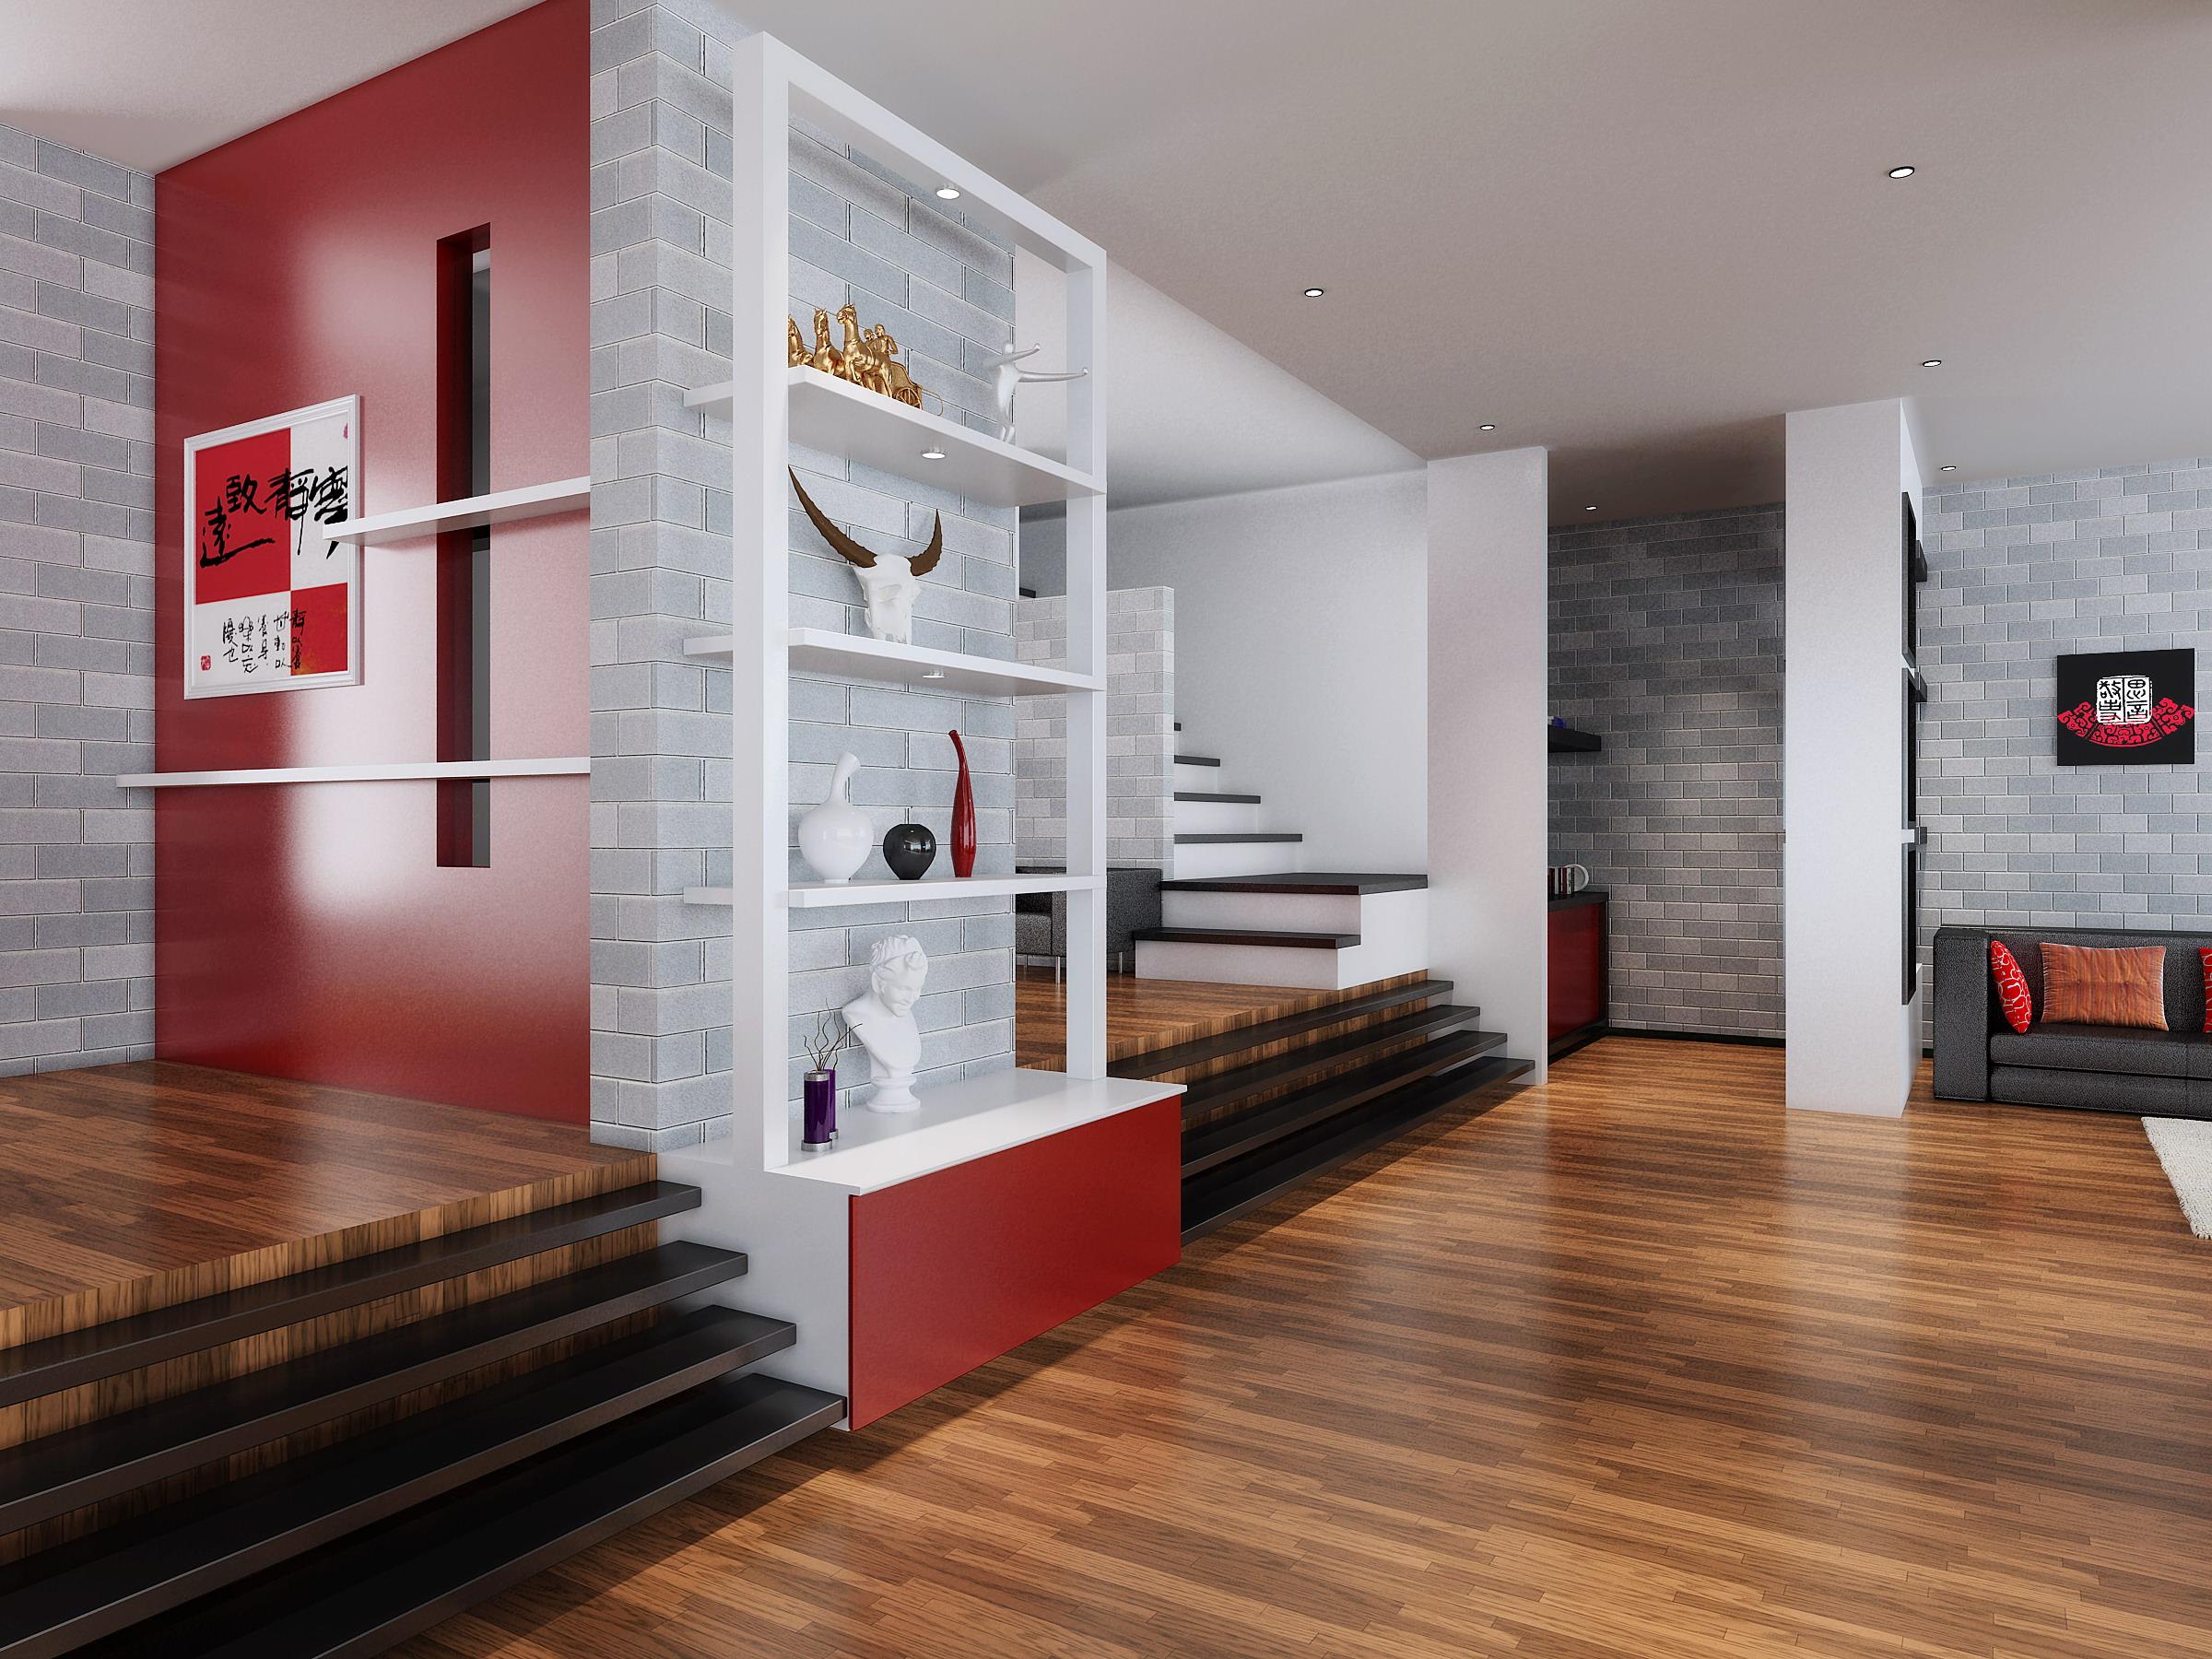 drawing room with red designer walls 3d model max 5 - Designer Walls